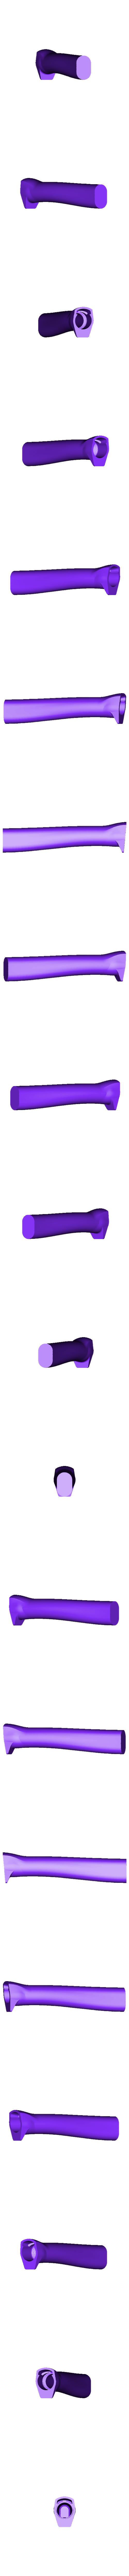 Zebco_Fishing_Handle_v1-2_Gold.STL Download free STL file Fishing Pole v2 • Model to 3D print, WalterHsiao